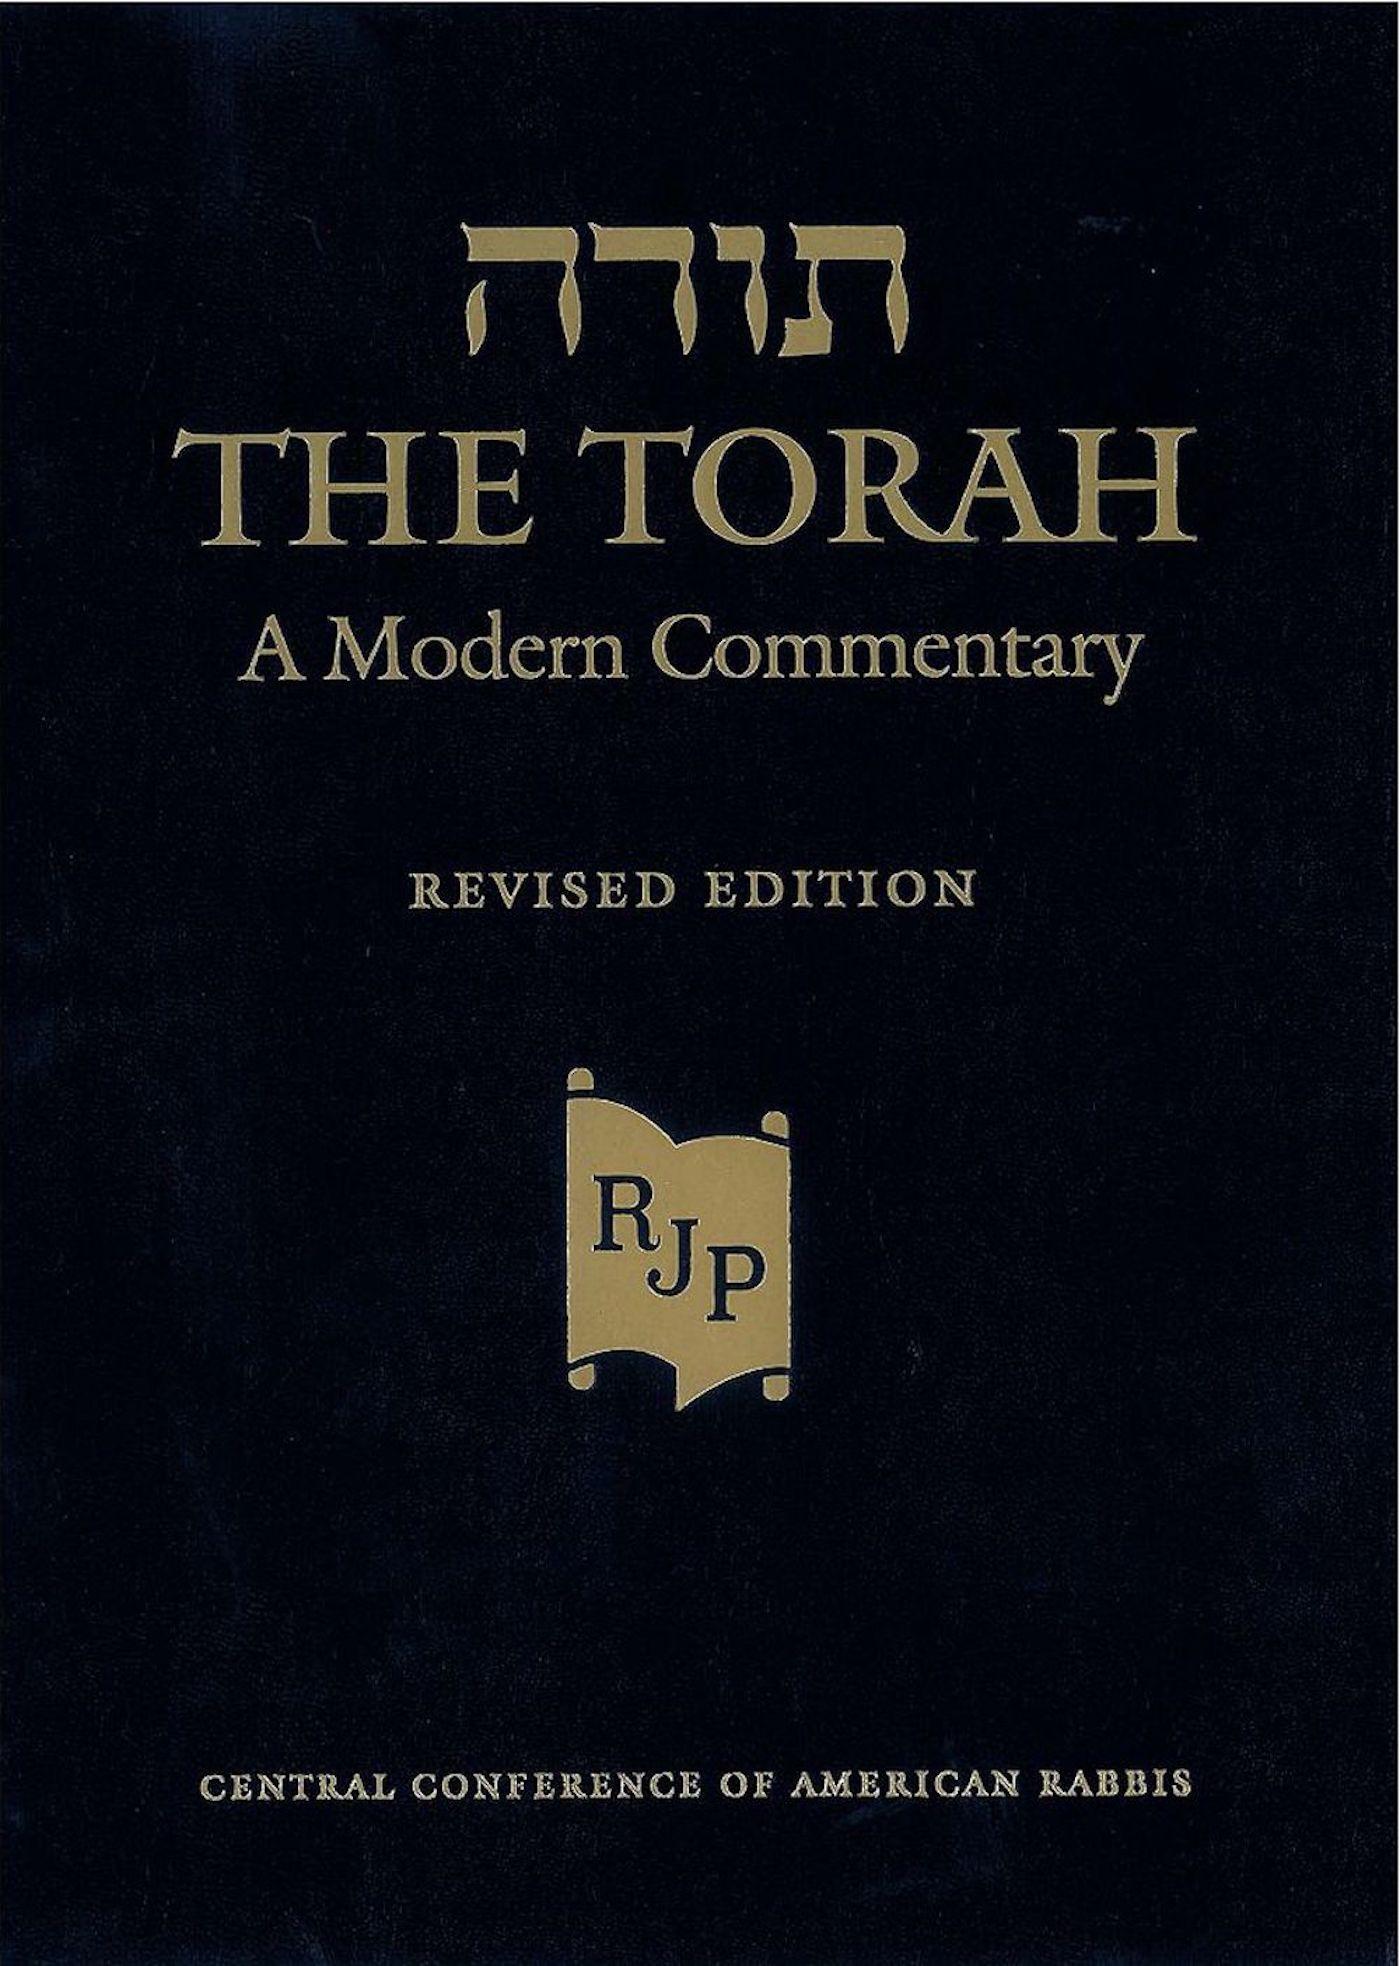 Torah, Revised Edition